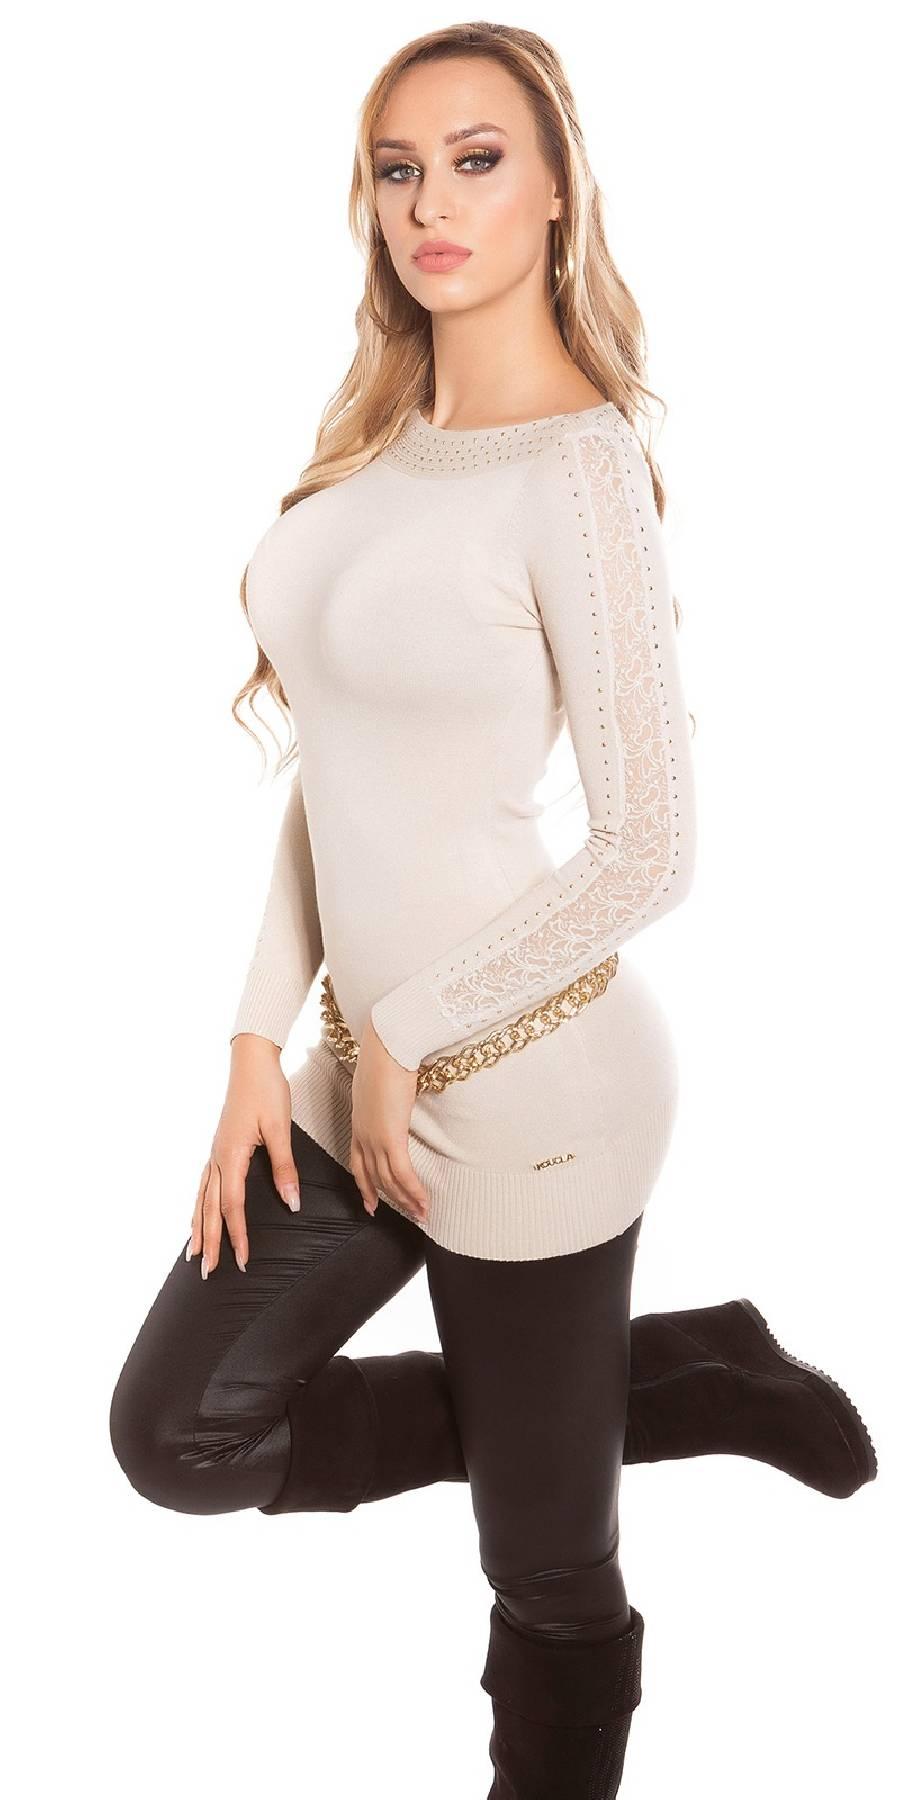 Robe femme tendance ADRIANA couleur blanc avec ceinture strass